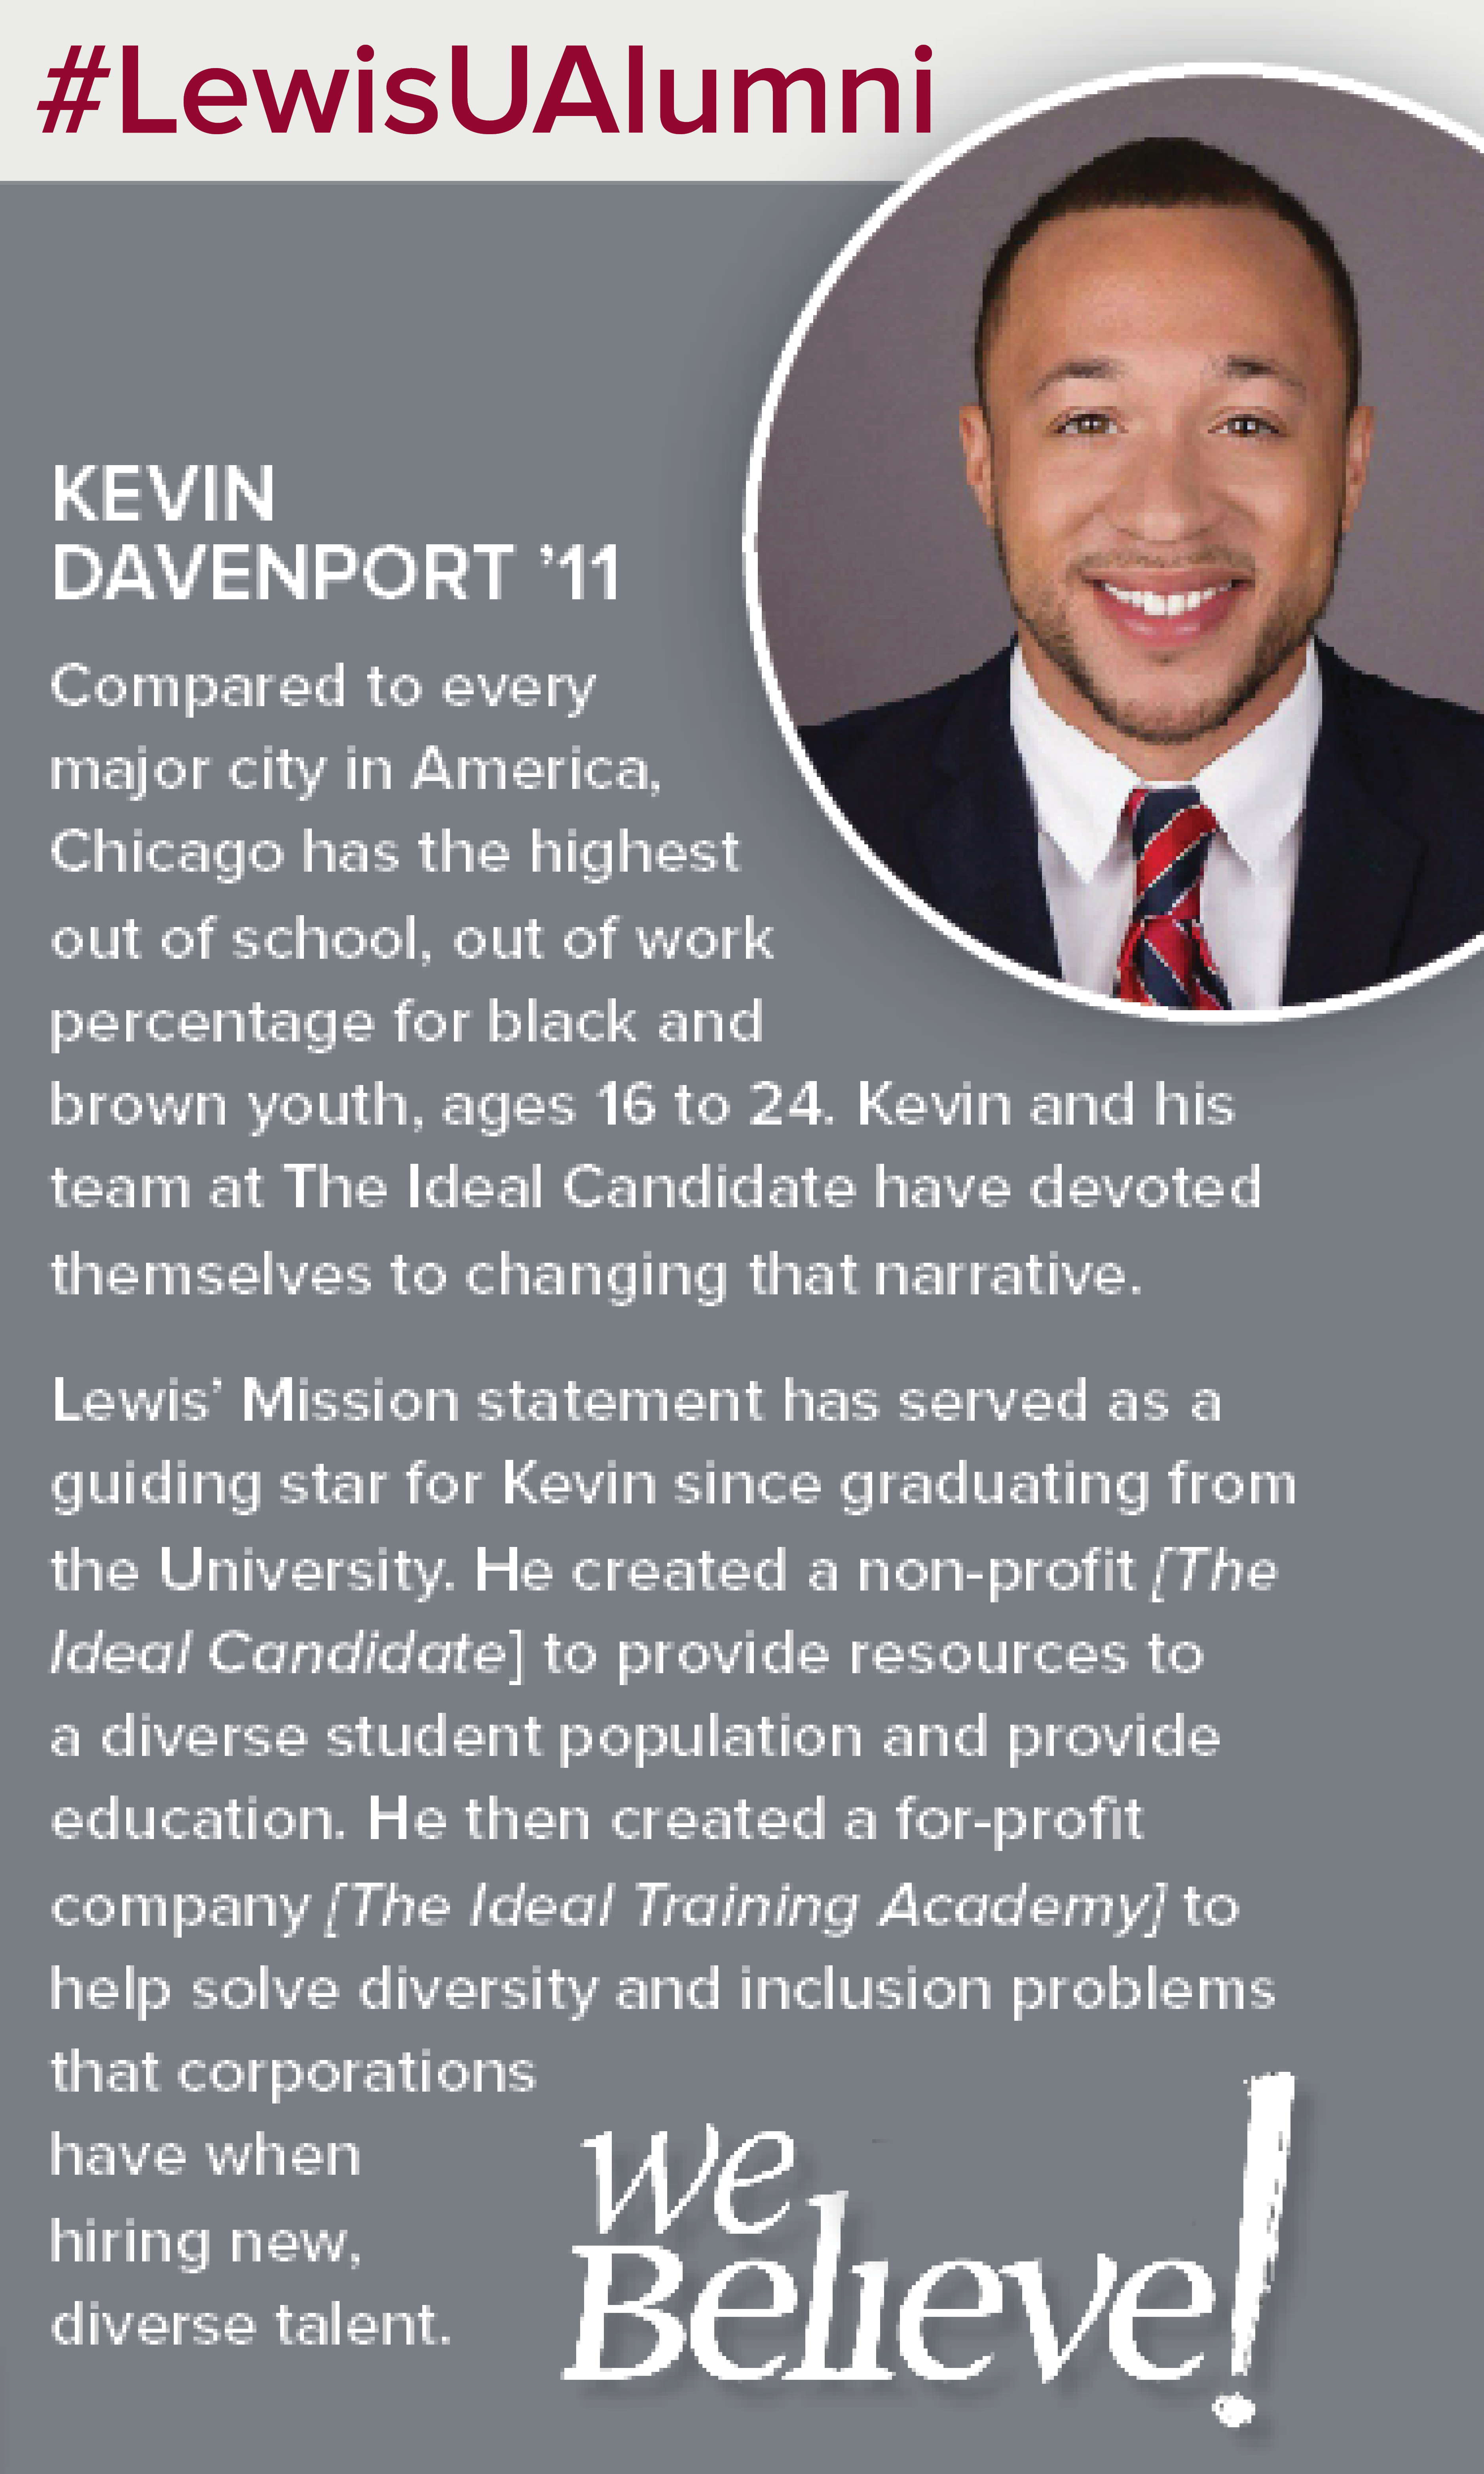 Kevin Davenport